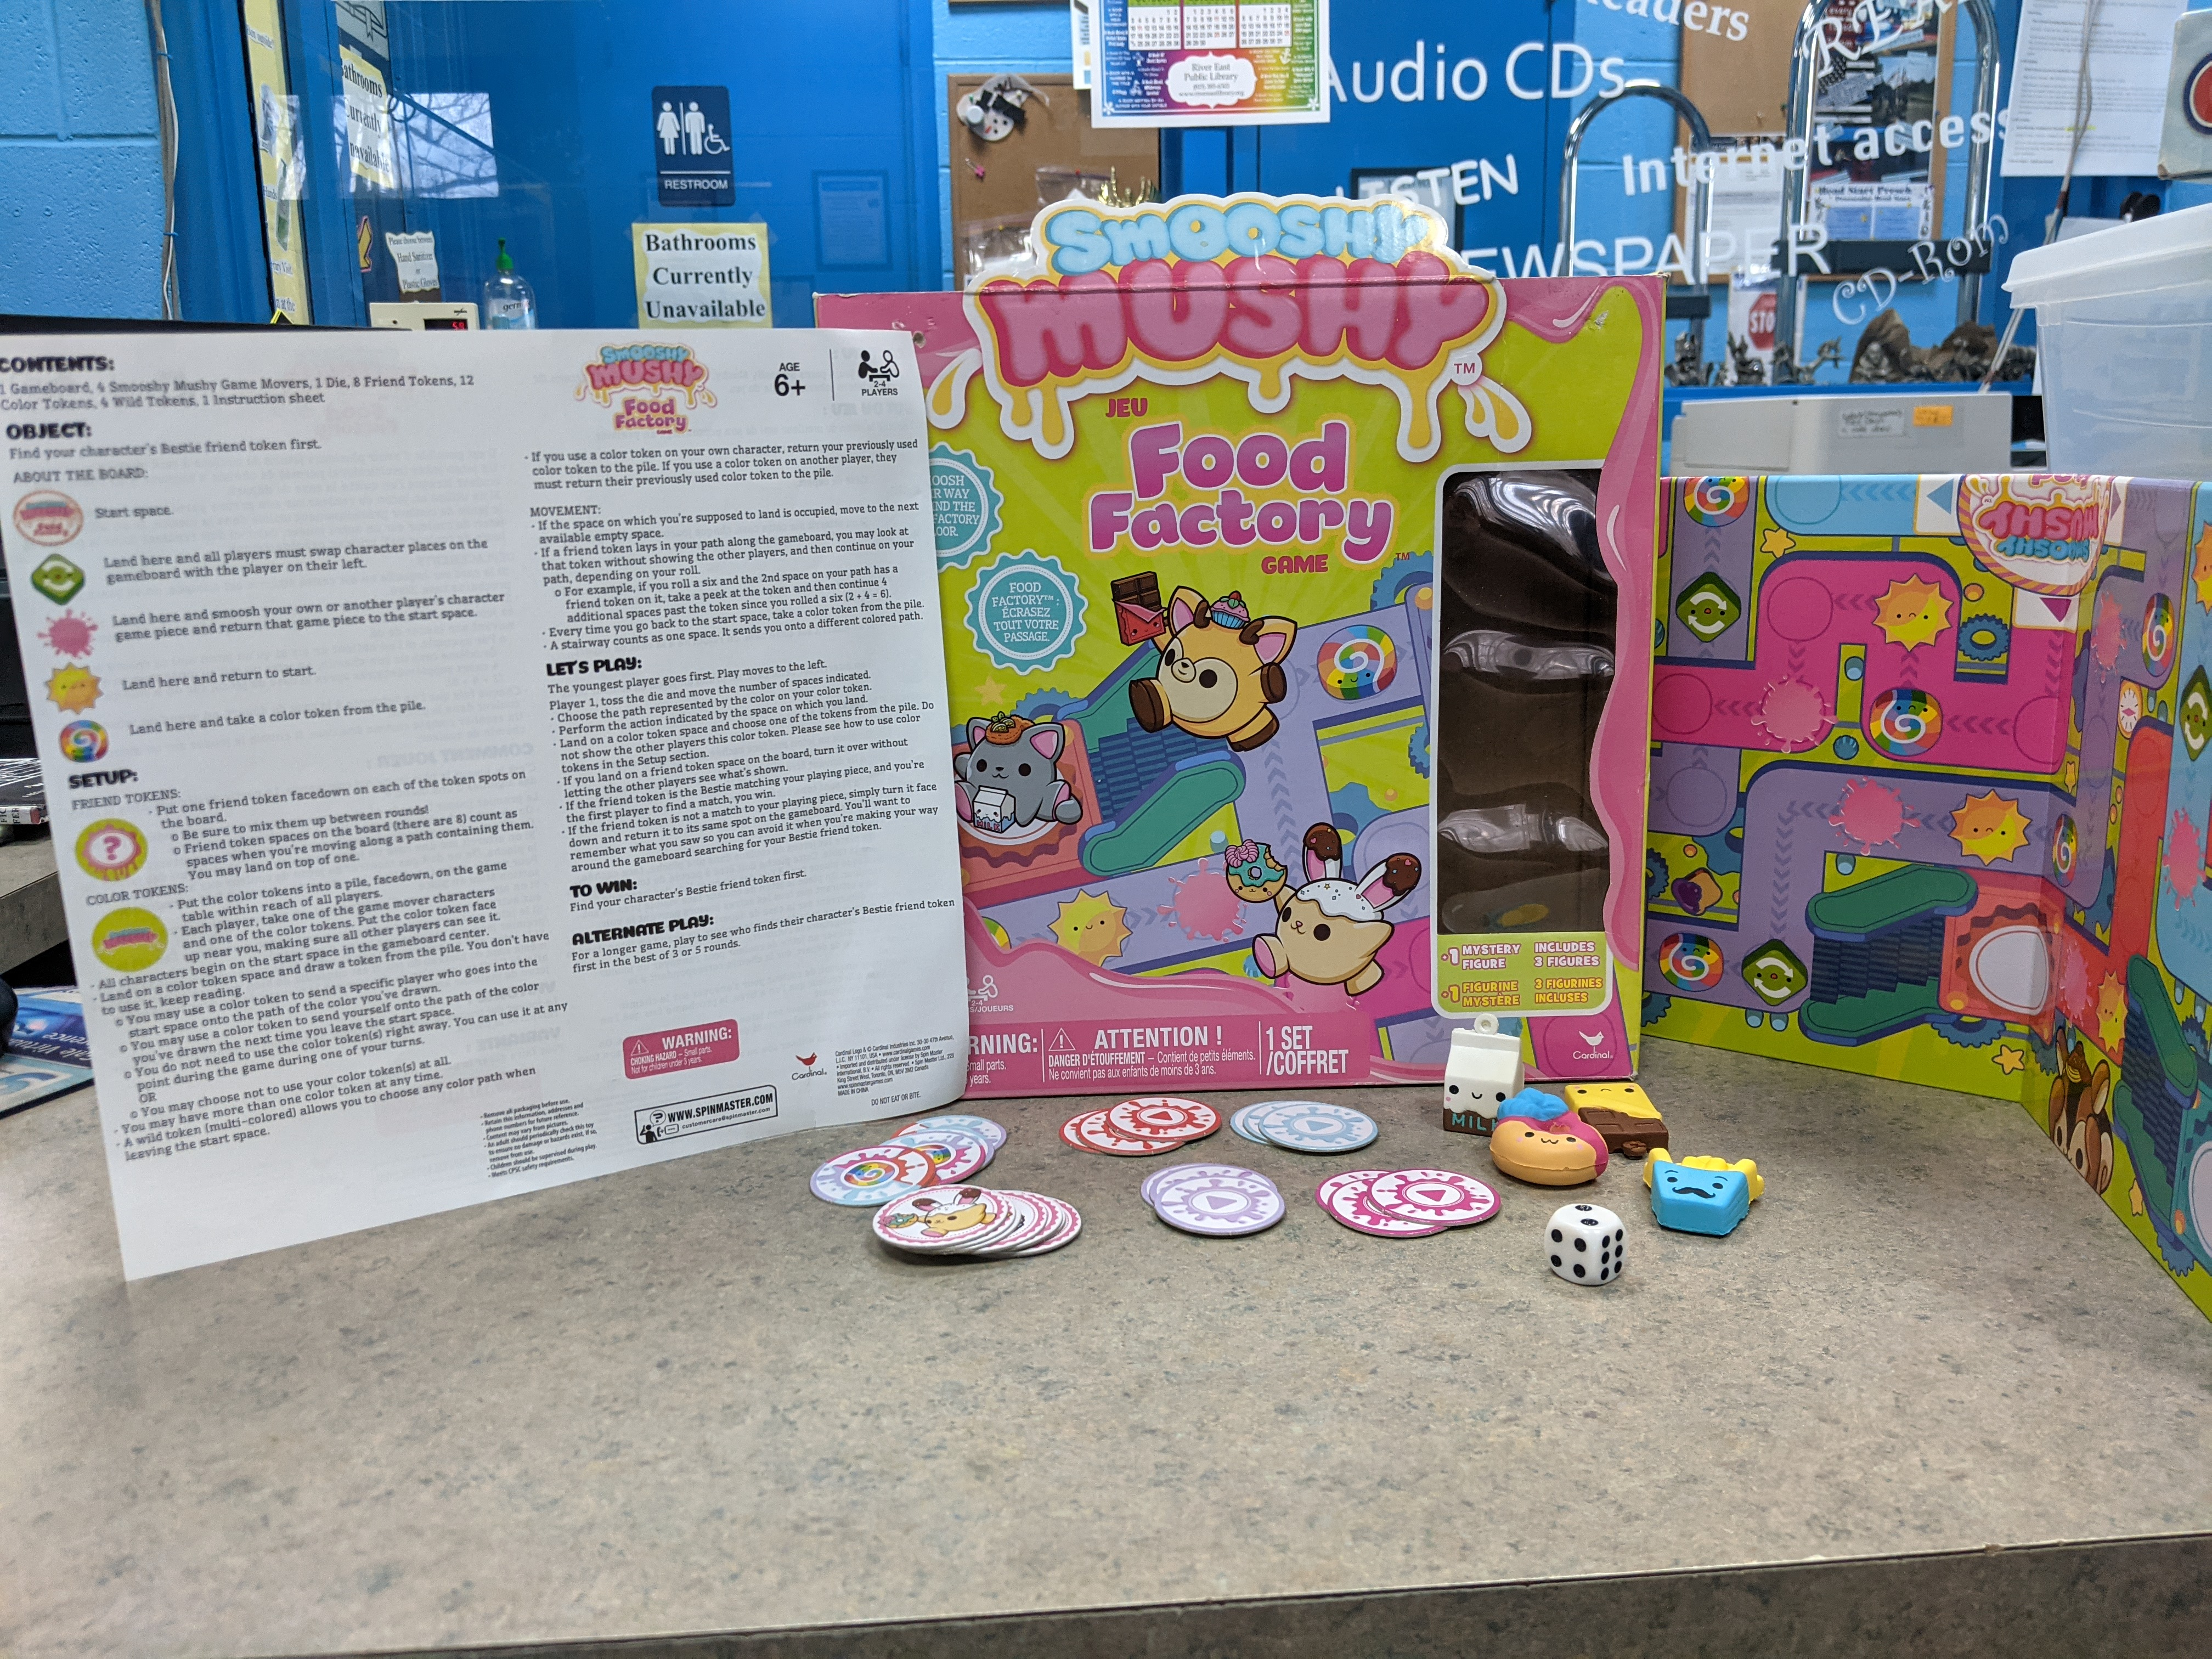 Image of Smushy Mushy Food Factory Game